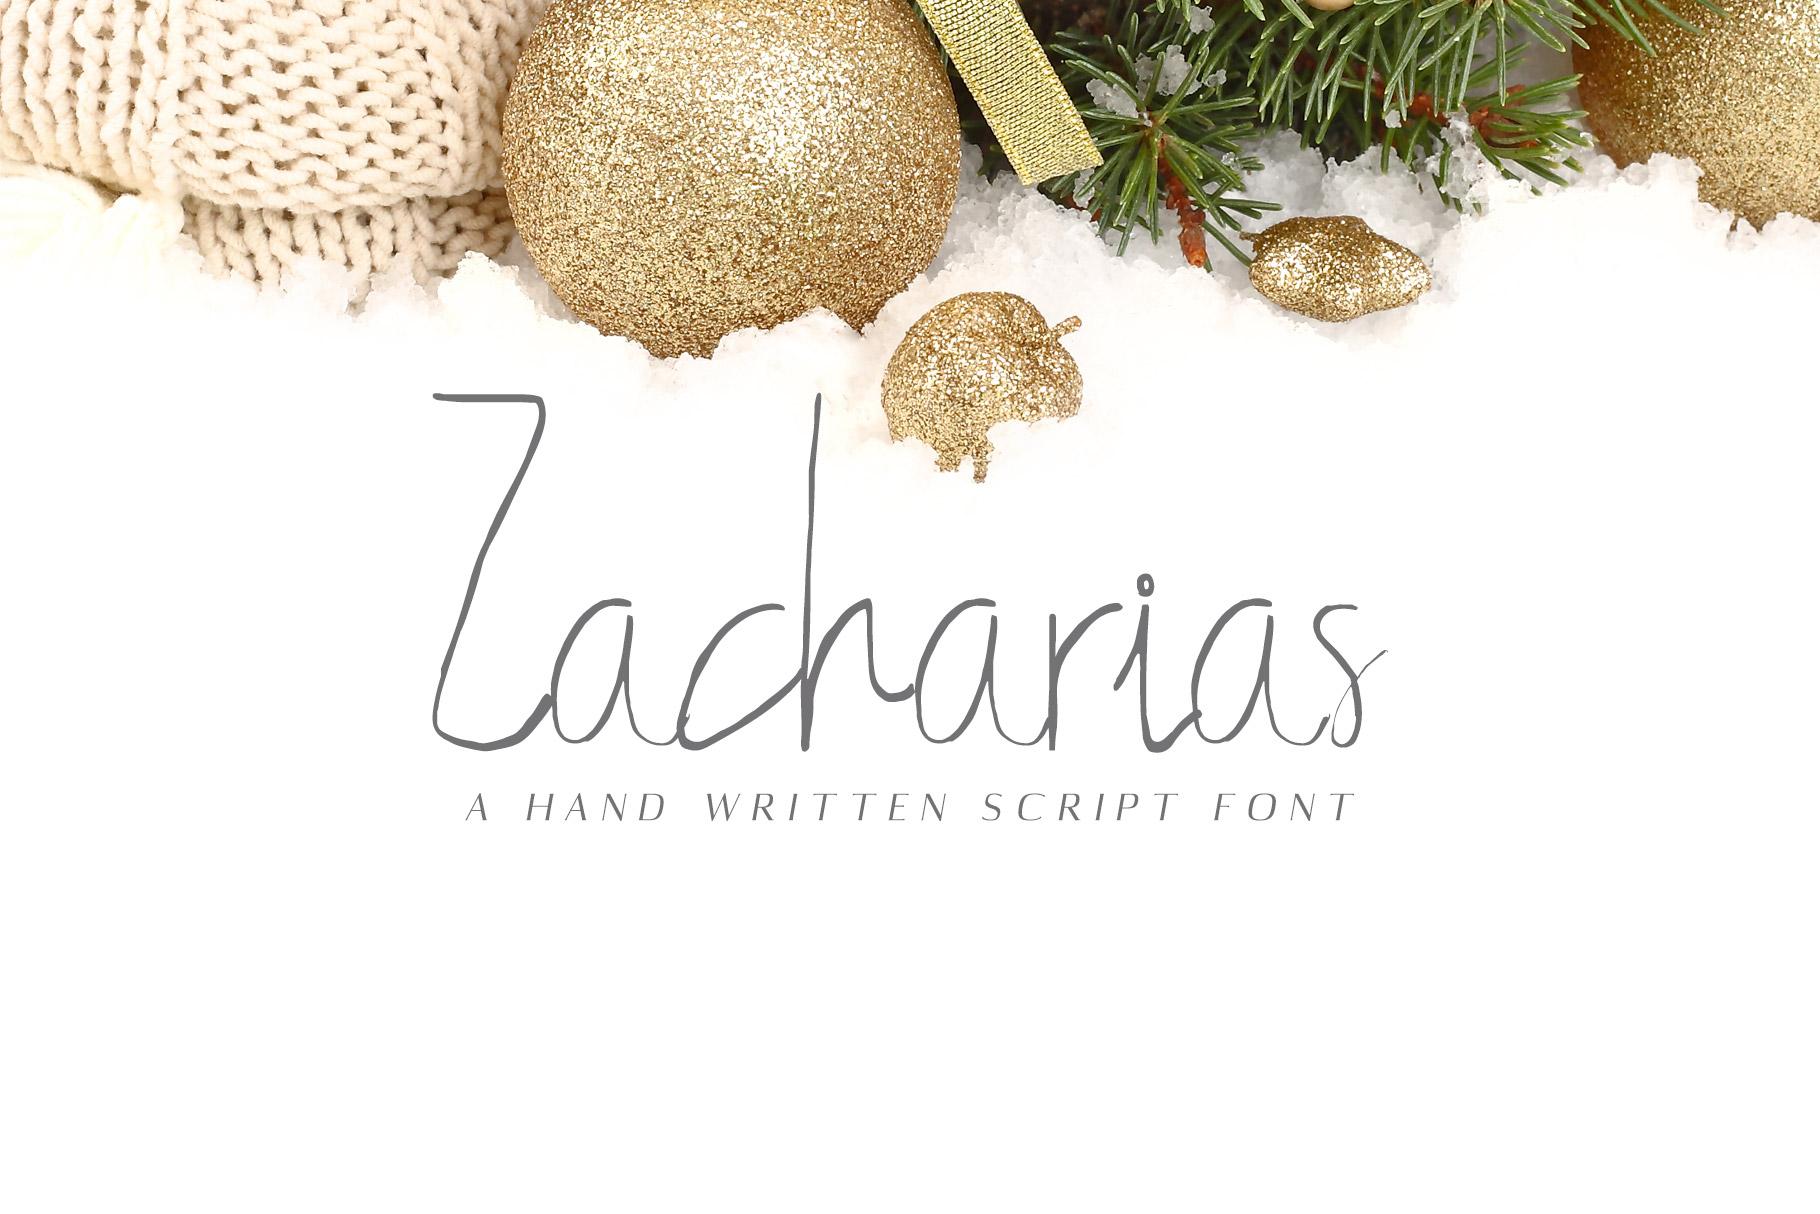 Free Zacharias Handwritten Script Font